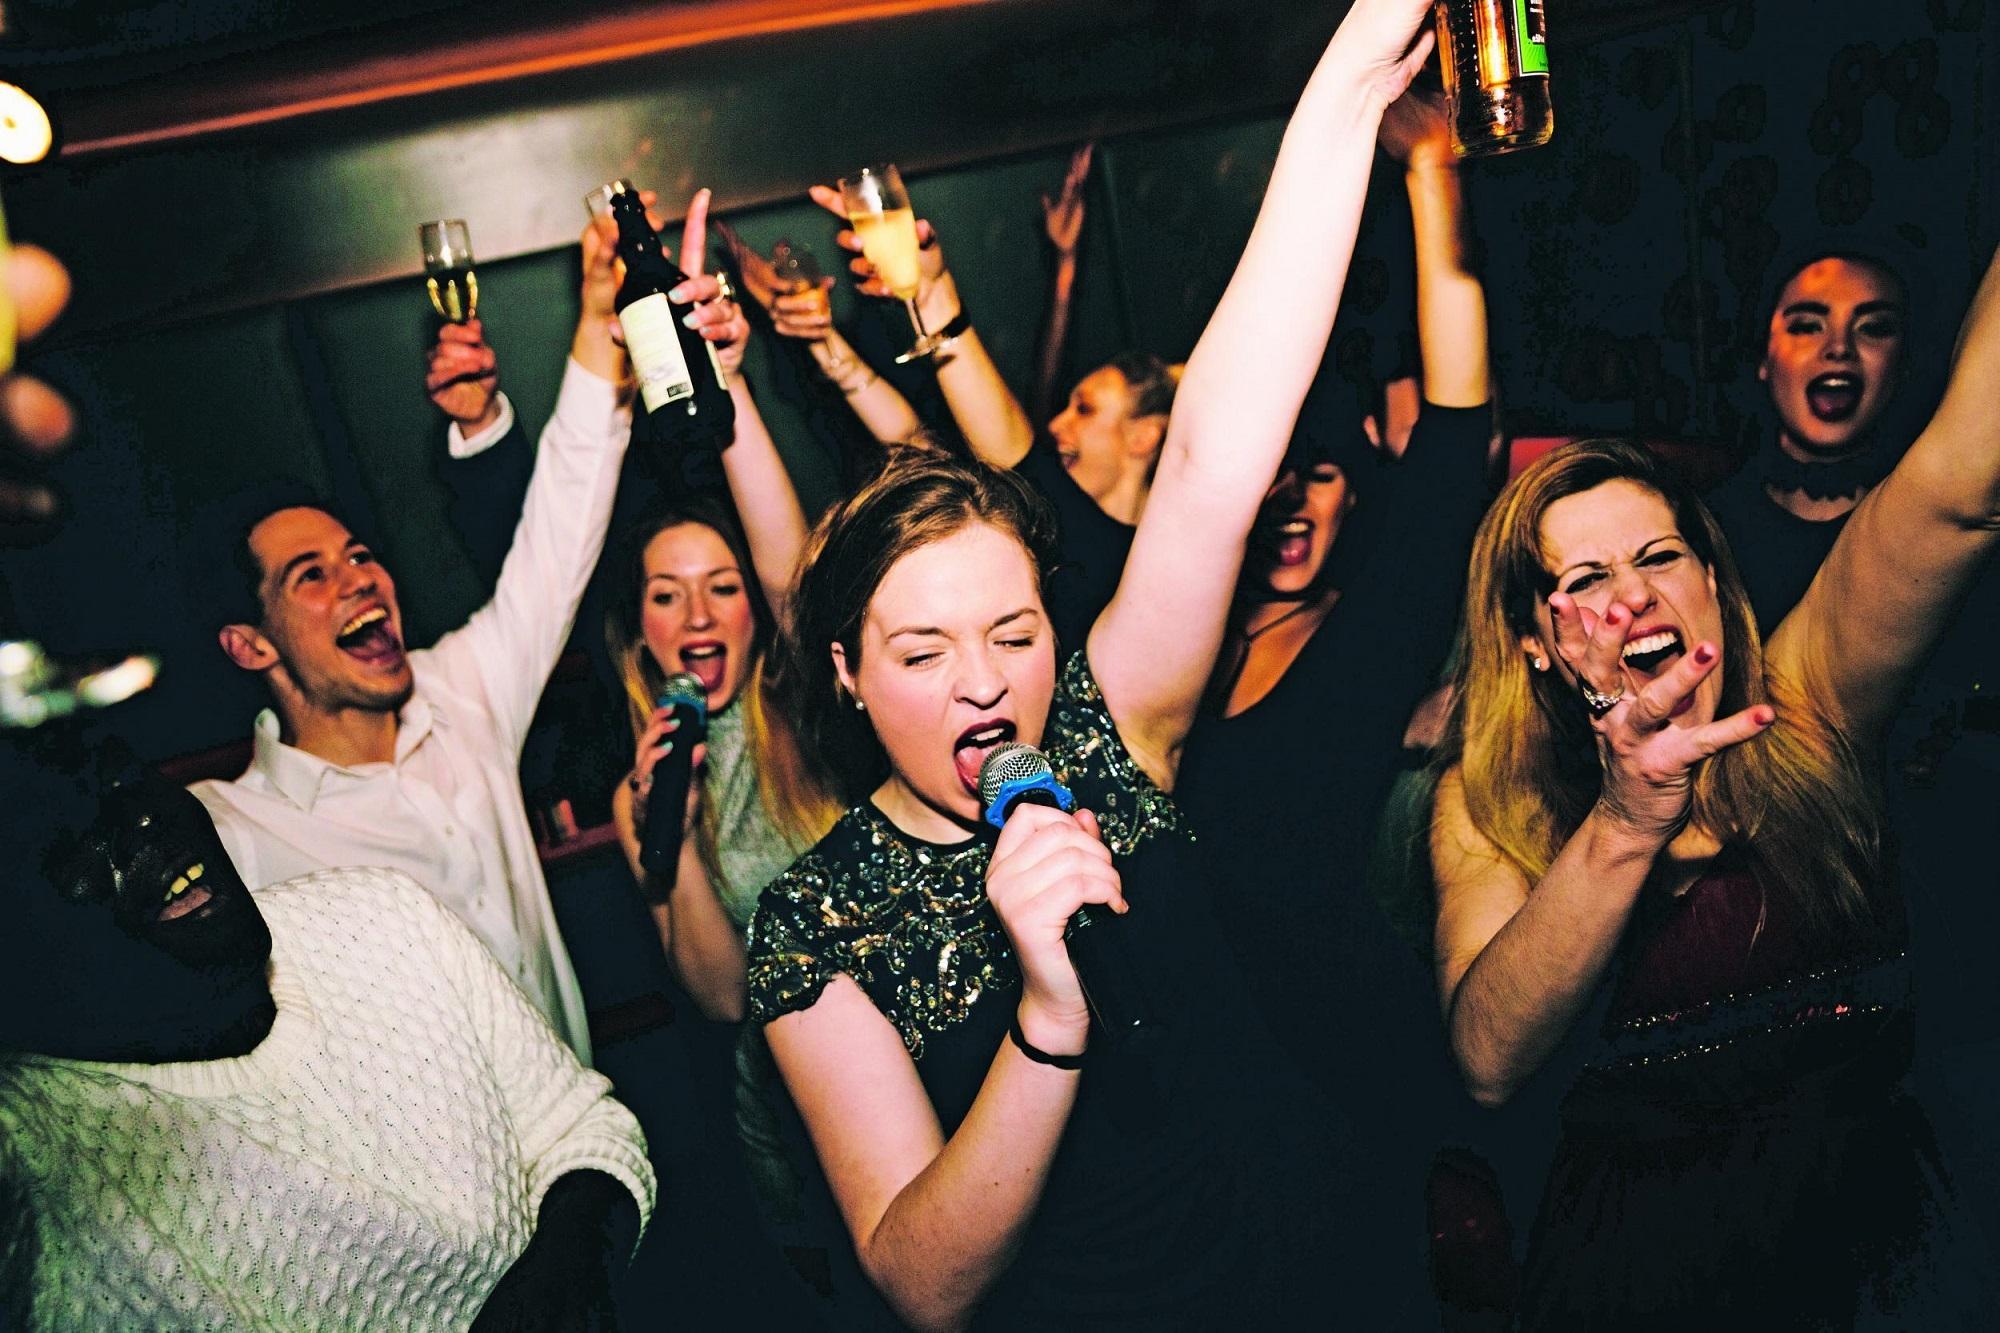 oxfordshire karaoke